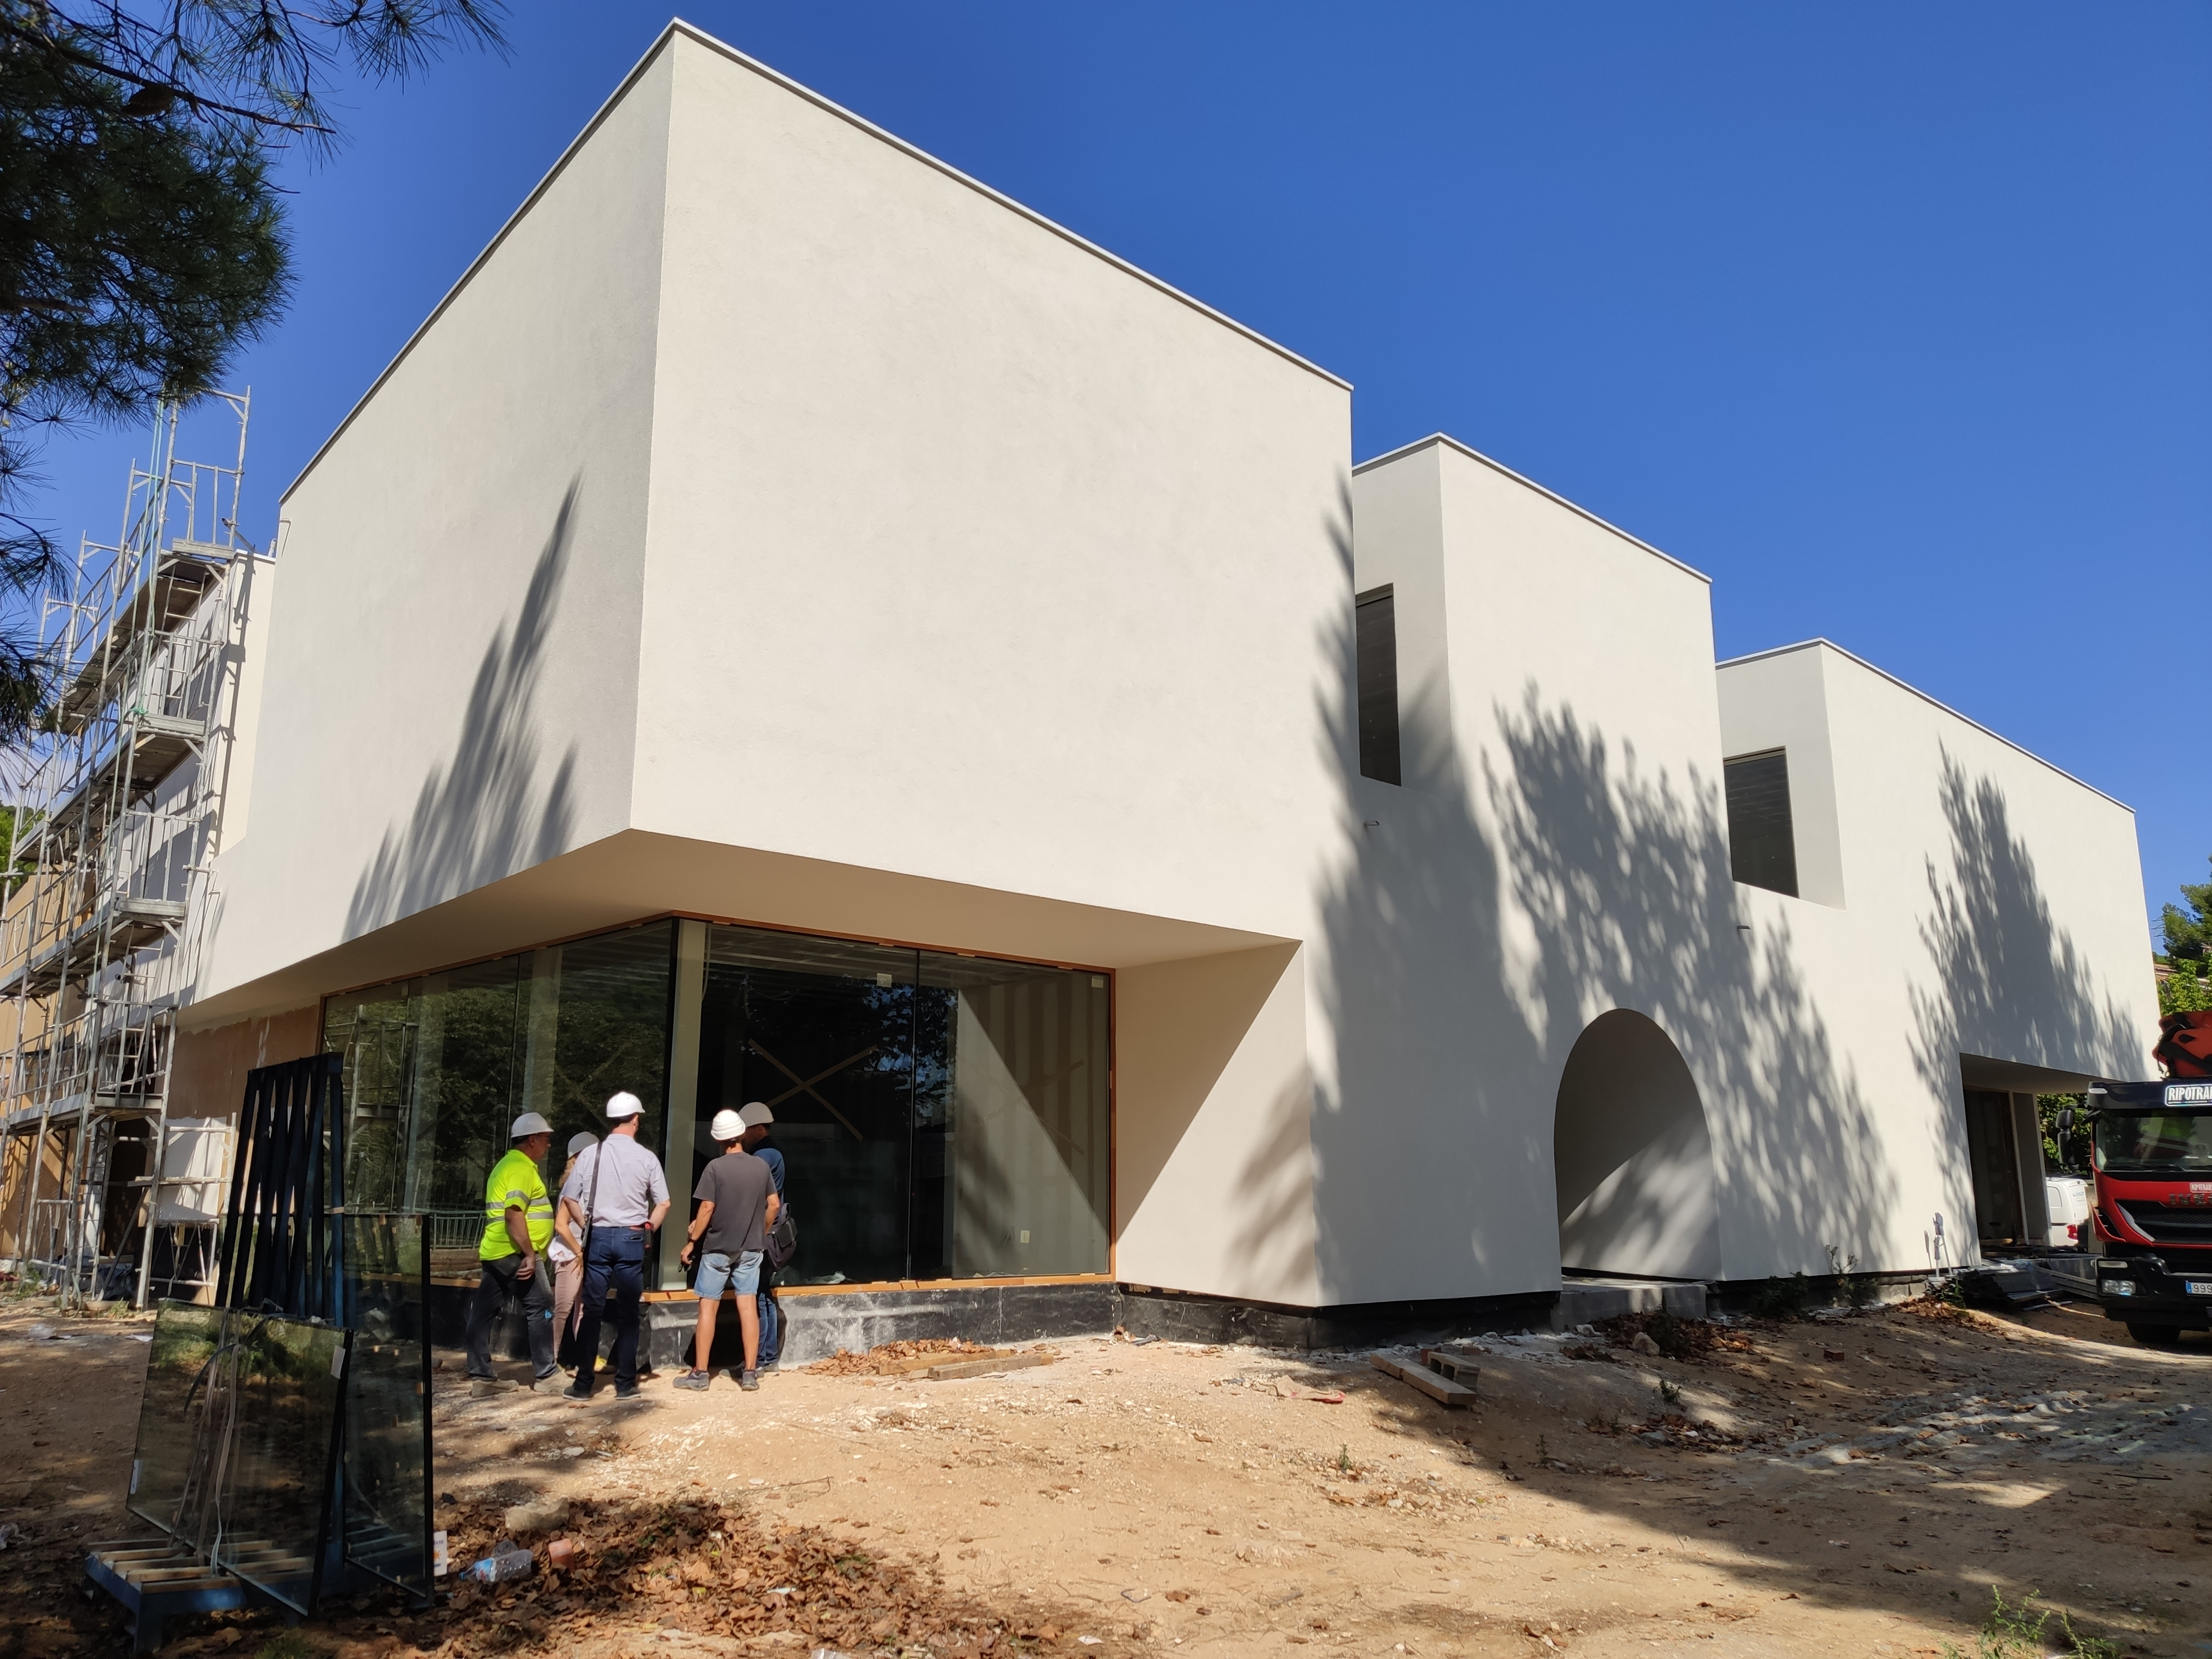 Fase final de les obres del nou Centre cívic de Castell d'Aro